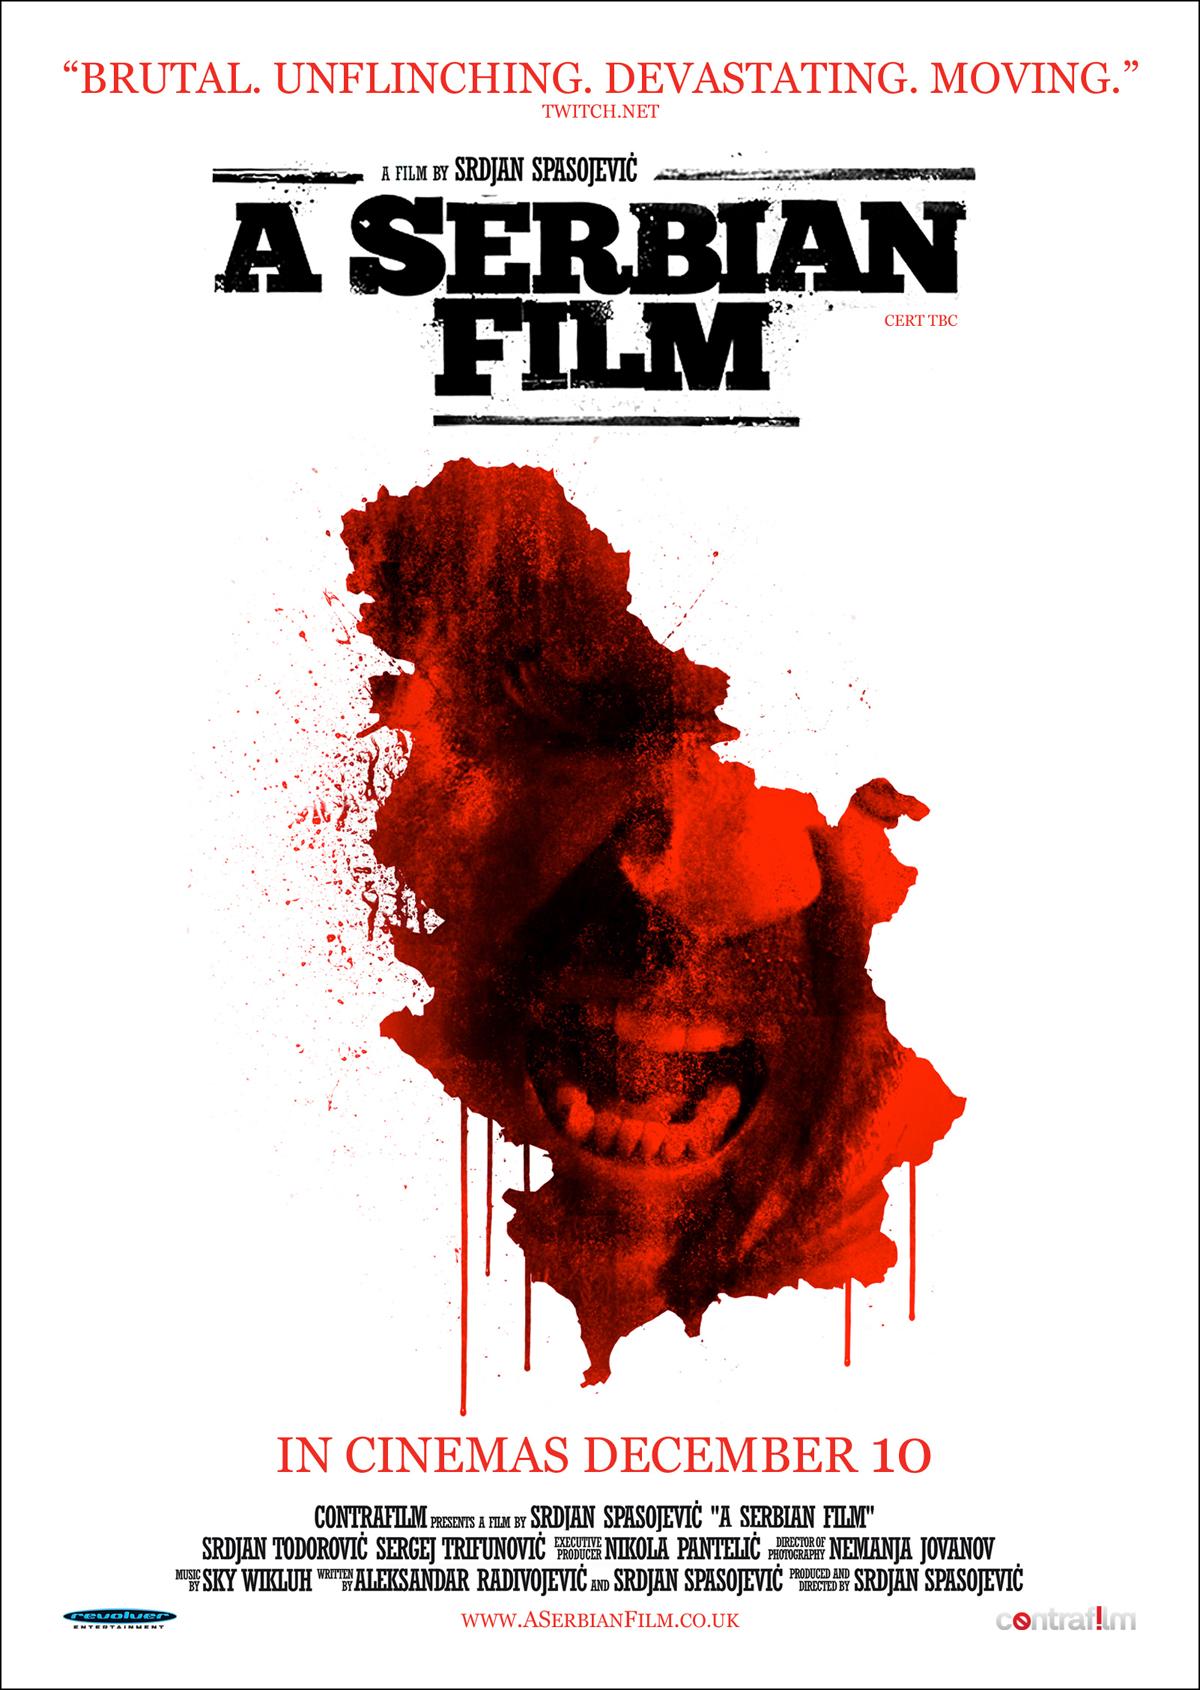 http://horroraddicts.files.wordpress.com/2011/04/a-serbian-film-srpski-film-movie-poster-2010.jpg